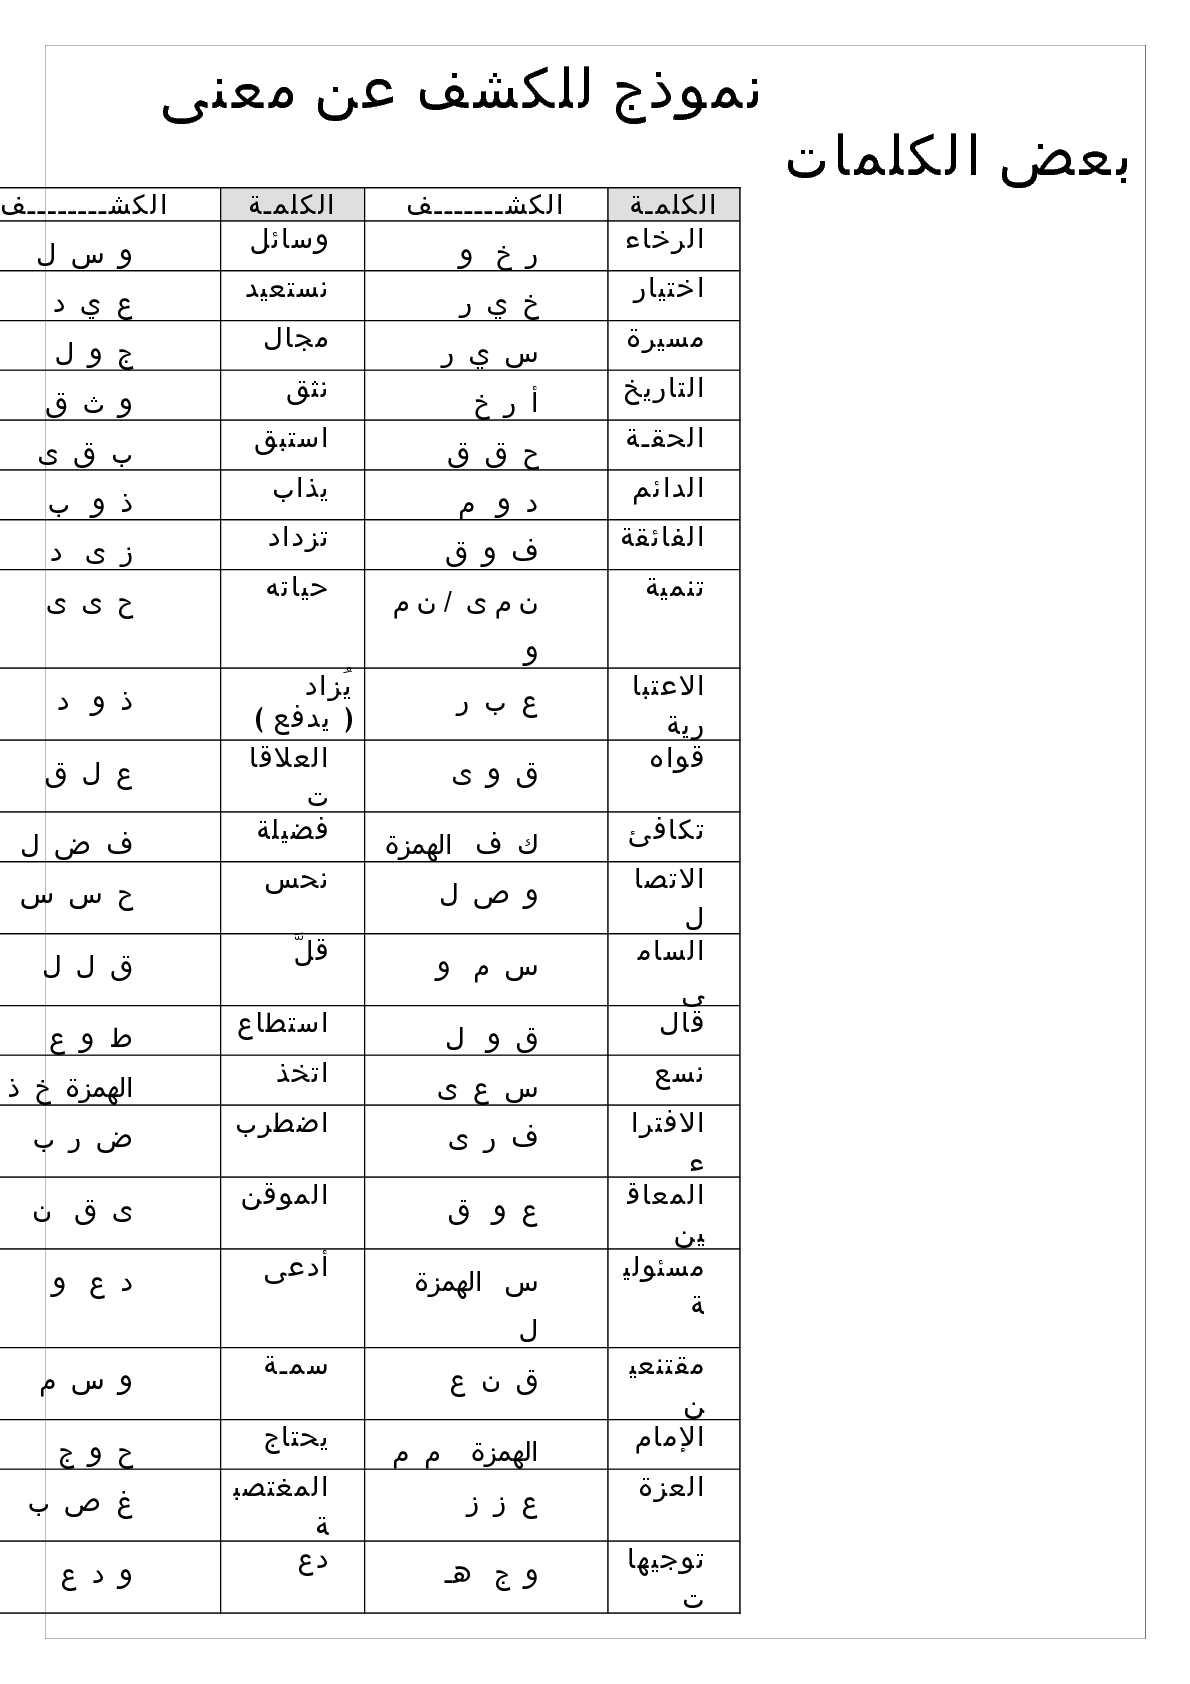 Calameo نحو 2 ثانوى نموذج للكشف فى المعجم عن معنى بعض الكلمات